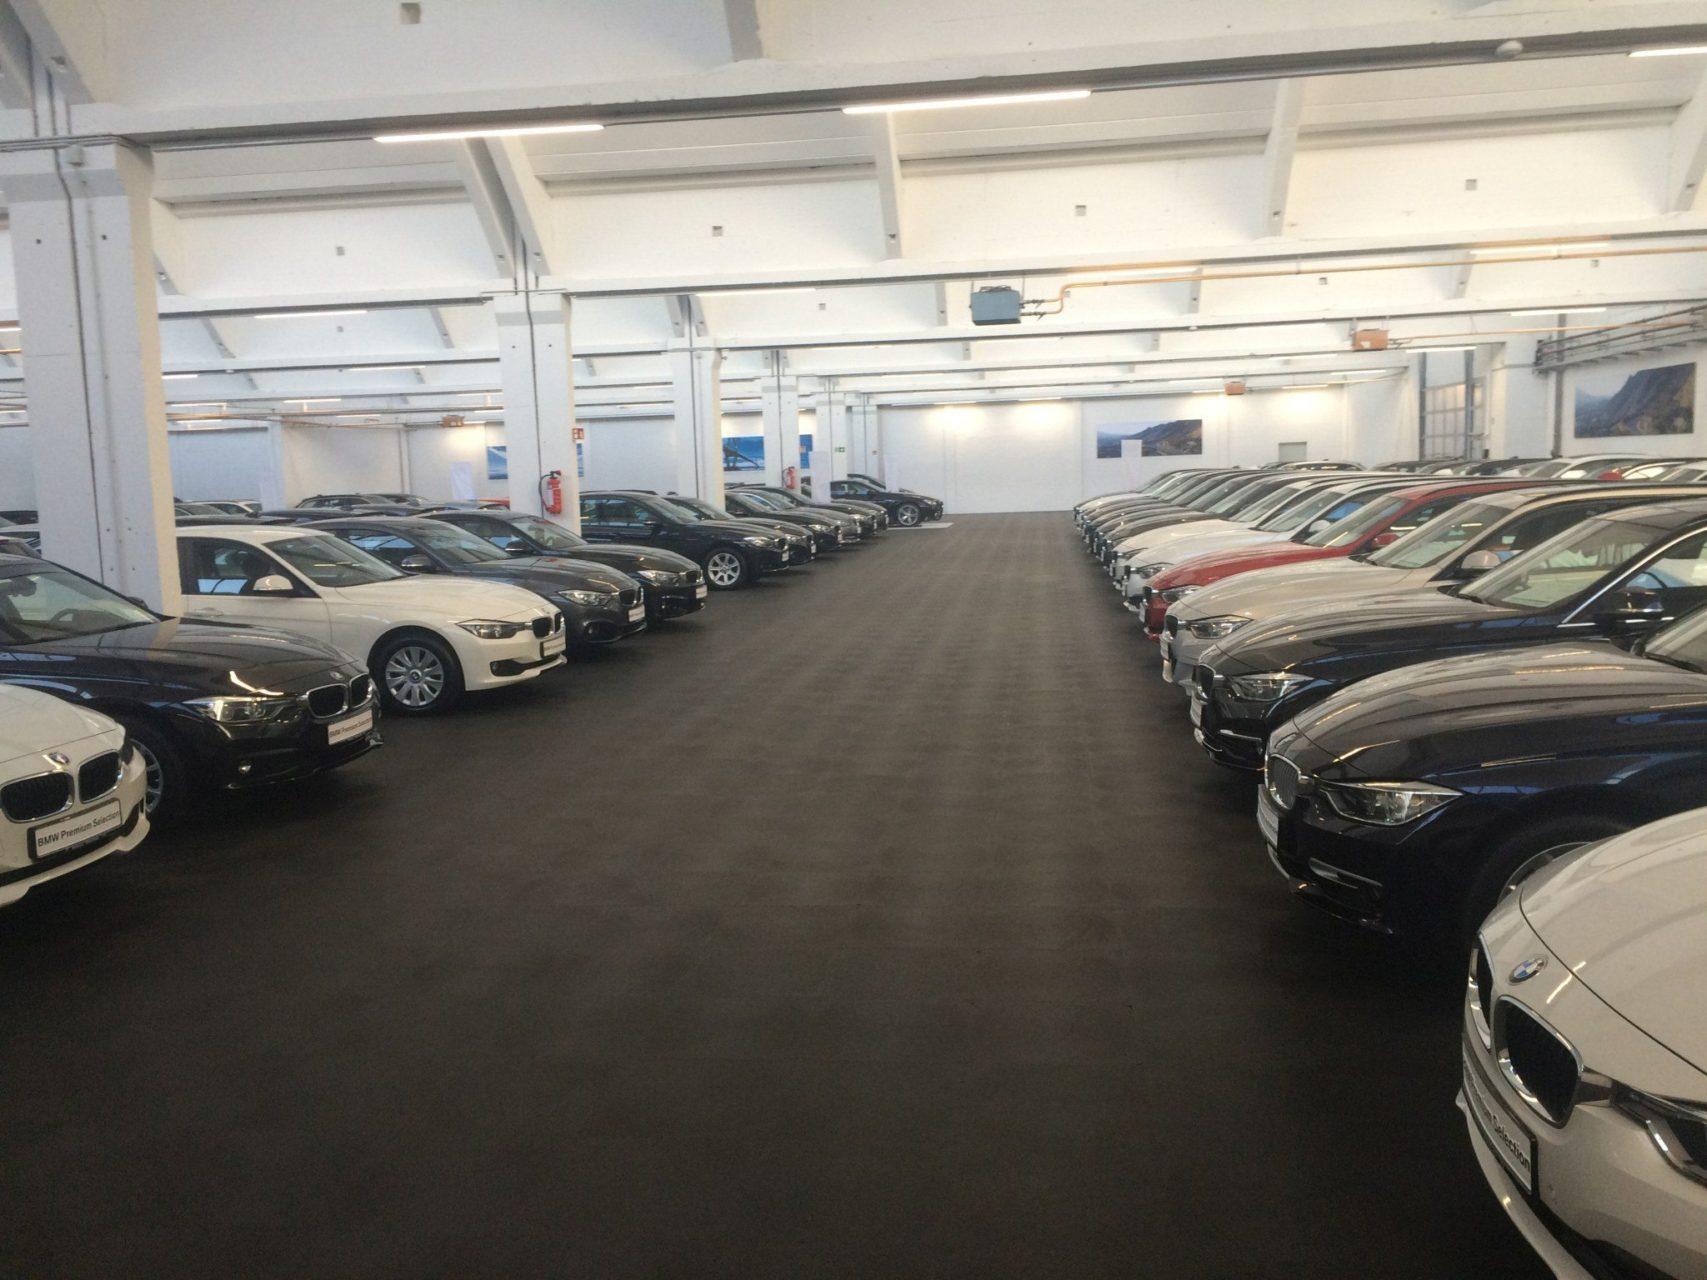 industrieboden-gewerbeboden-kfz-werkstatt-reifenservice-jp-mechanic-pvc-fliese-platte-garagen-autohändler-autohaus-showroom-autohandel